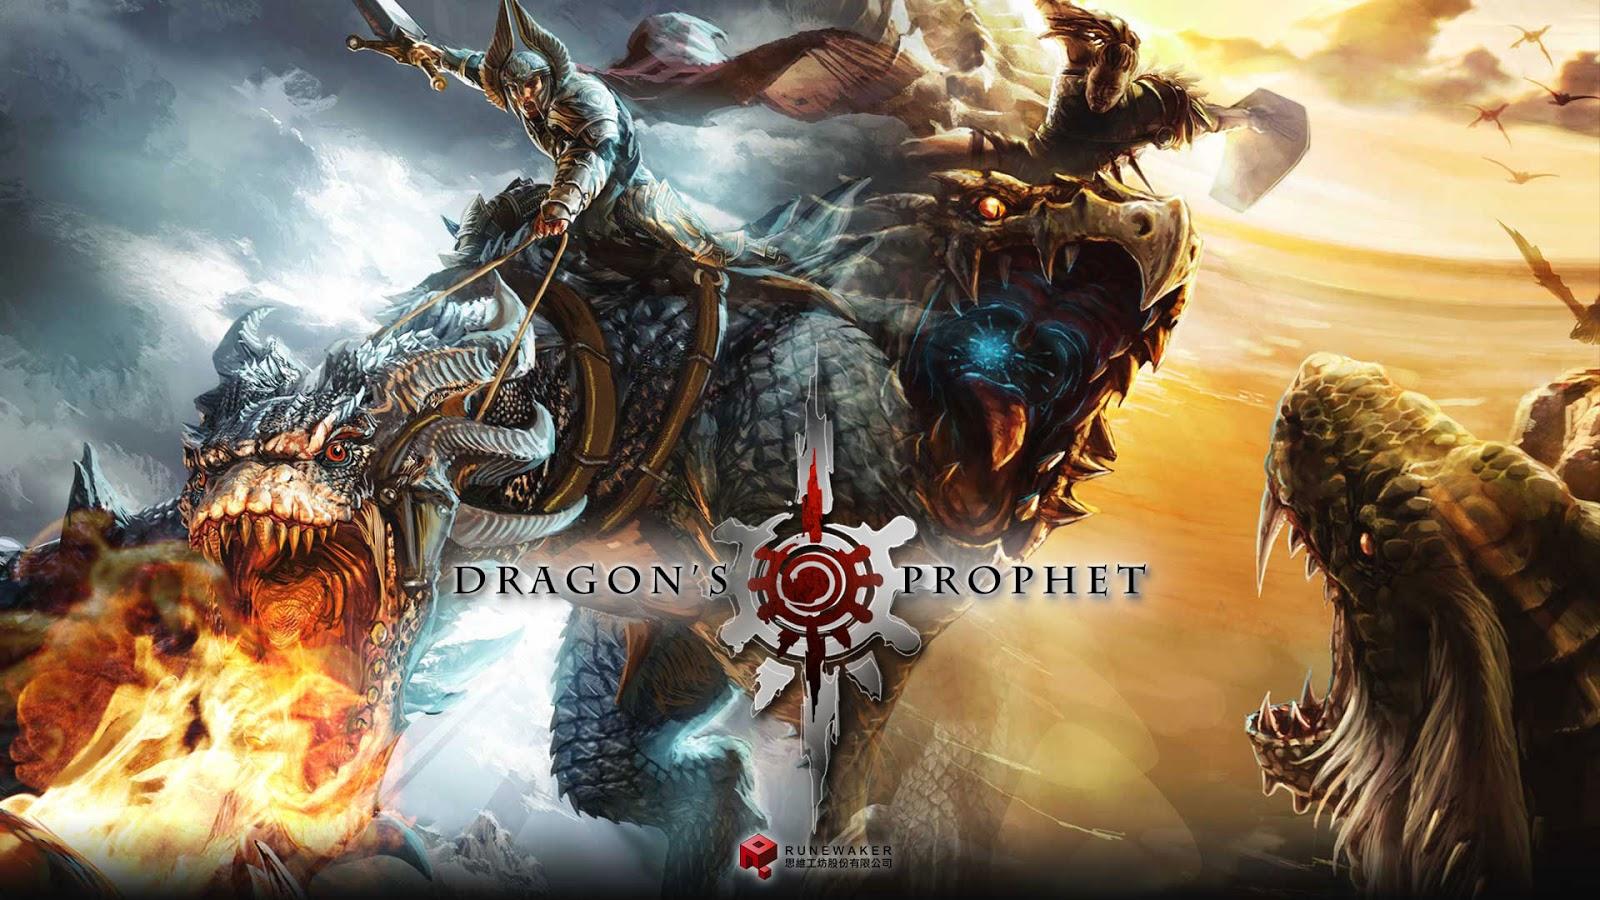 http://3.bp.blogspot.com/-n76lgvoXsKU/UR0PLZF1wPI/AAAAAAAAaRg/mNuy1vRSnn4/s1600/Dragons-Prophet-wallpaper-1.jpg